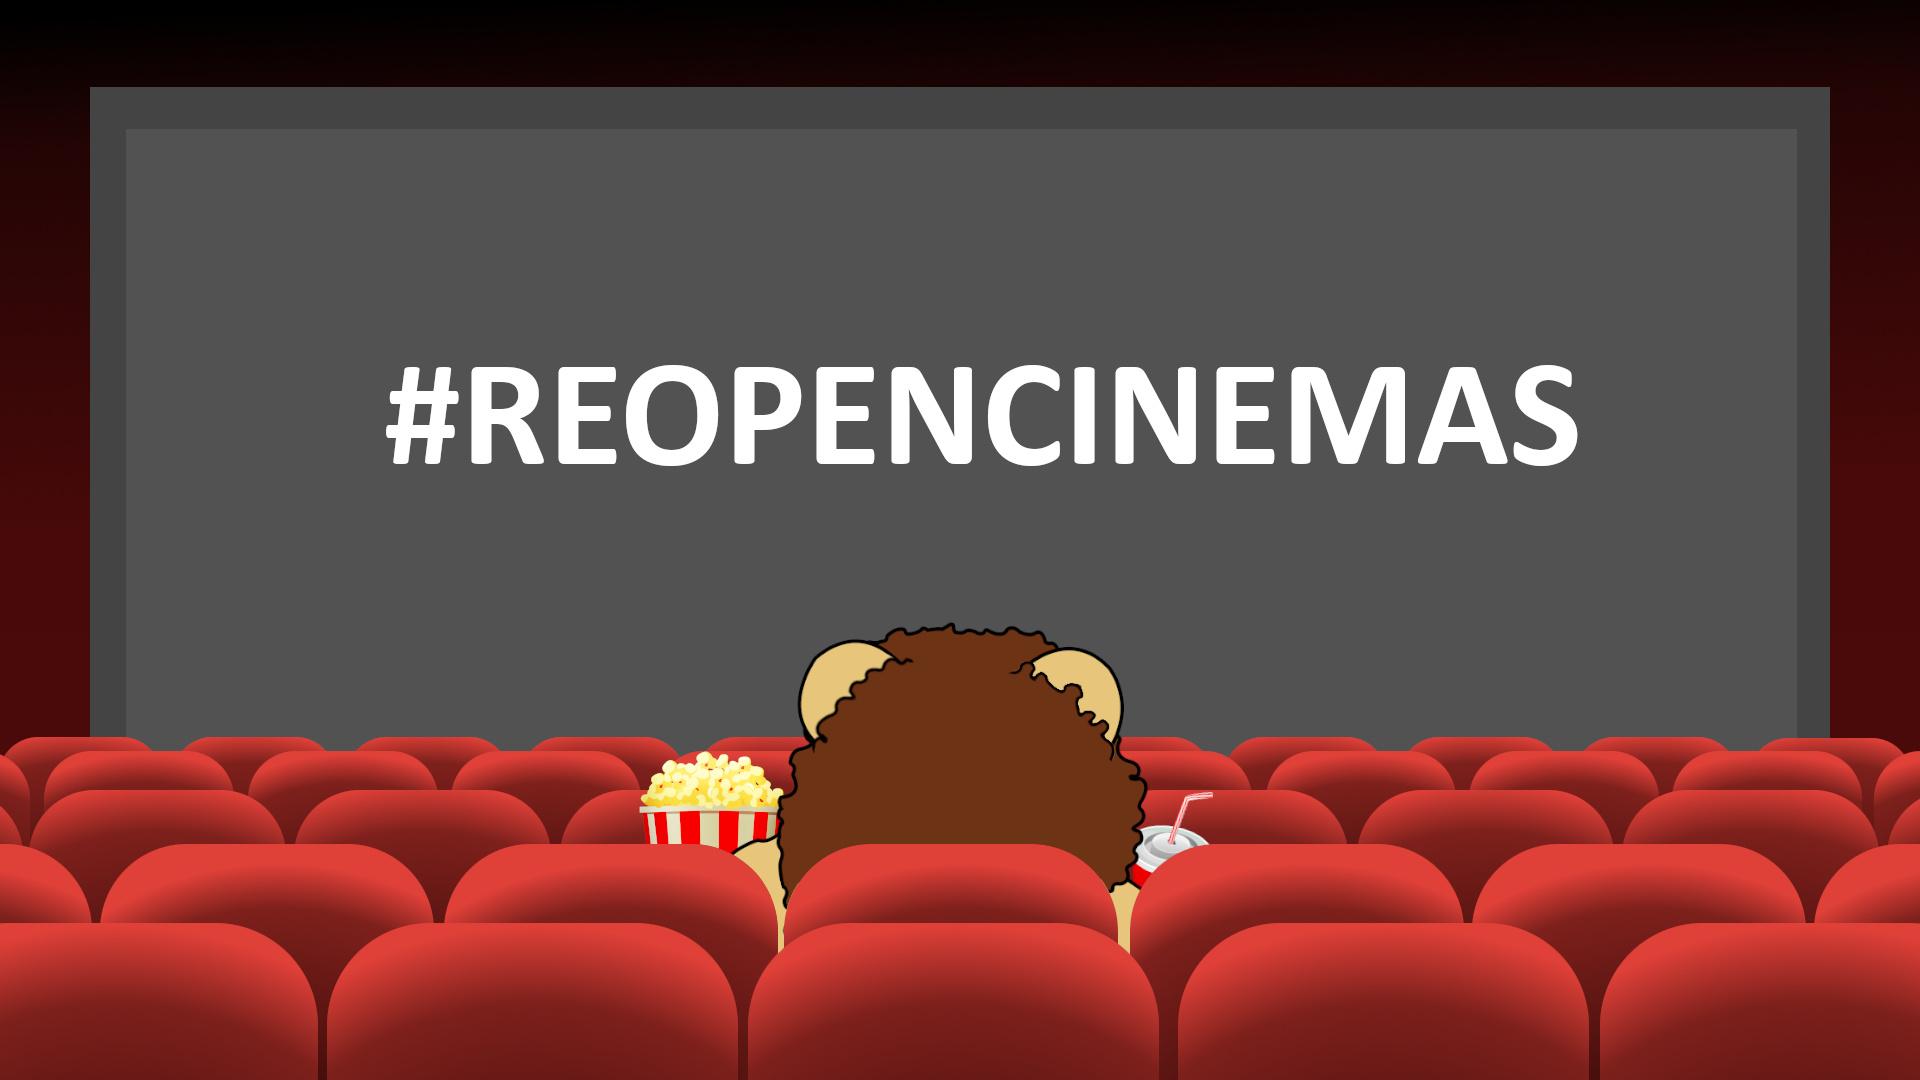 Malaysian cinemas will be operating again!